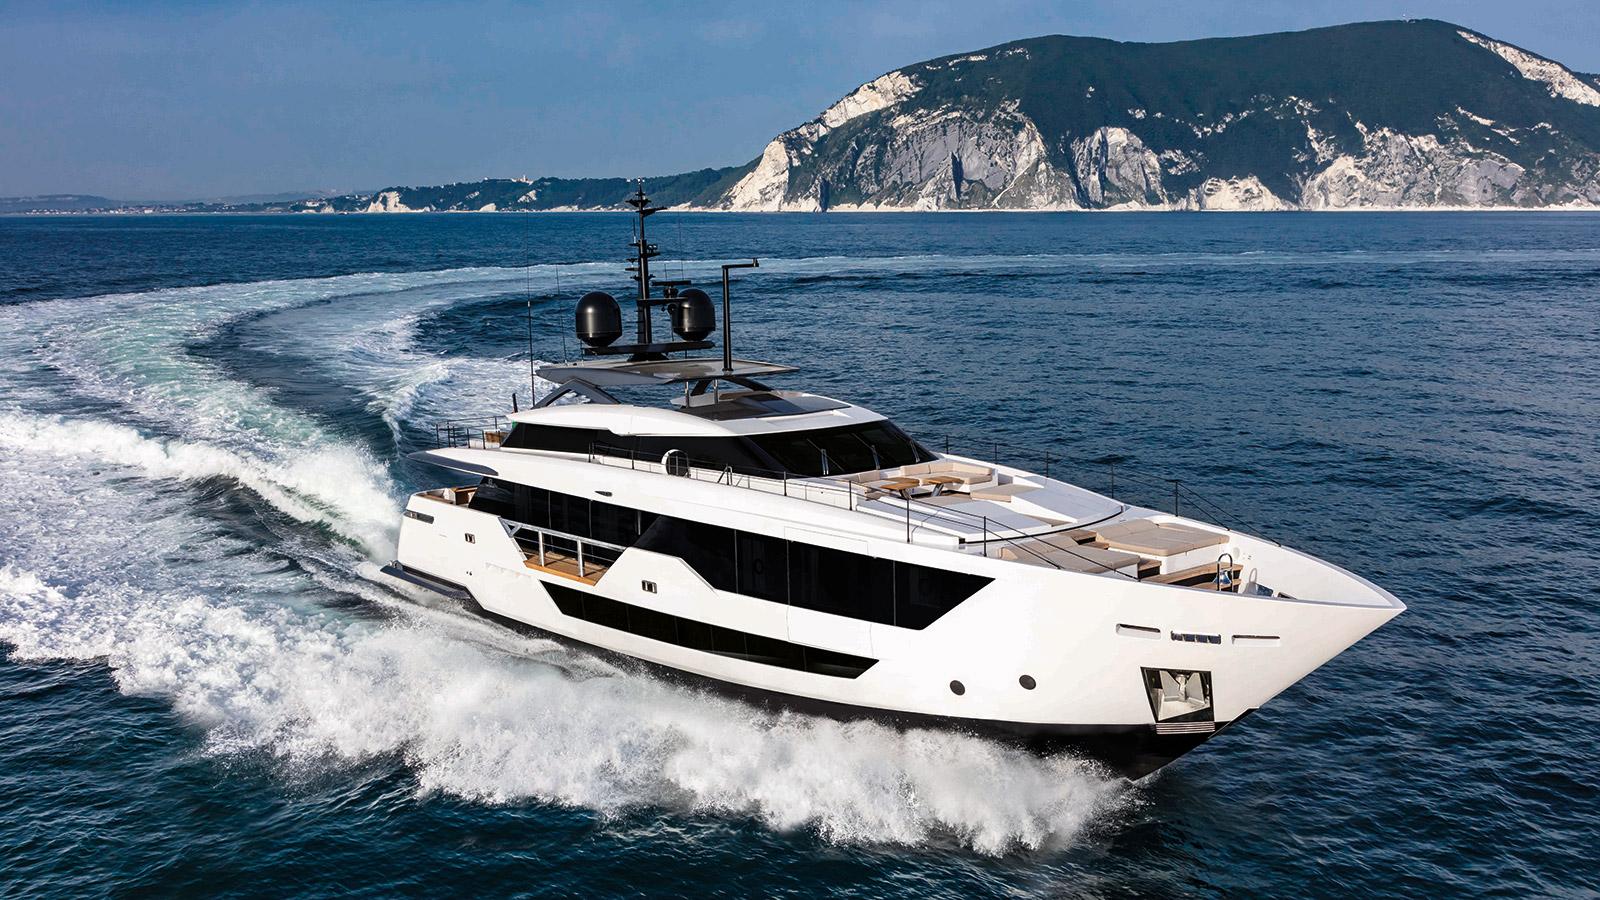 IV DREAMS yacht (Custom Line, 32.79m, 2019) | Boat International